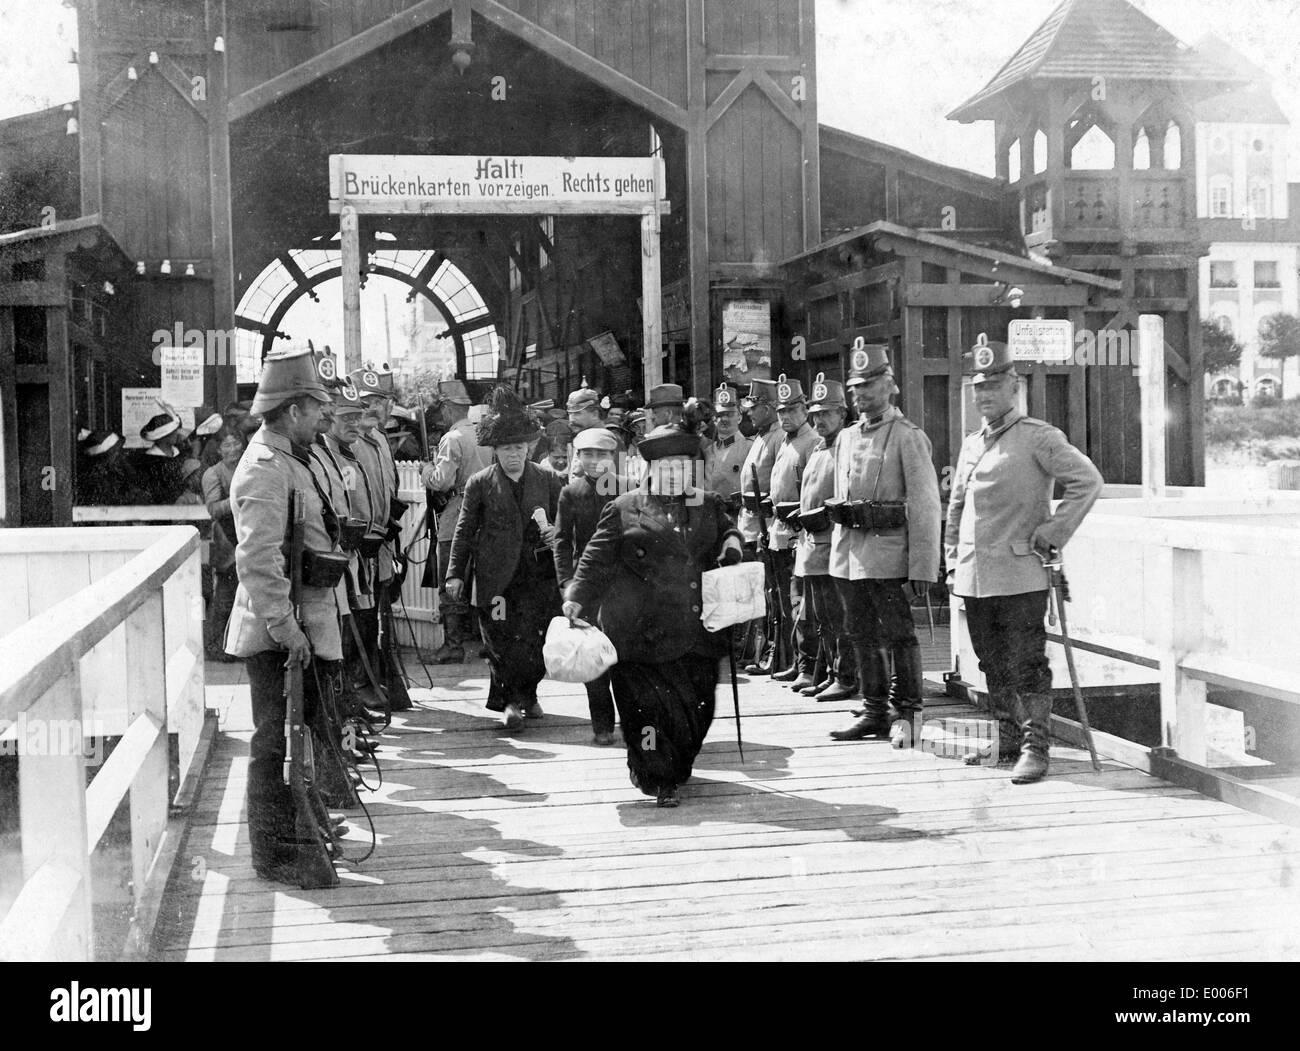 Expulsion of Russian citizens, 1914 - Stock Image